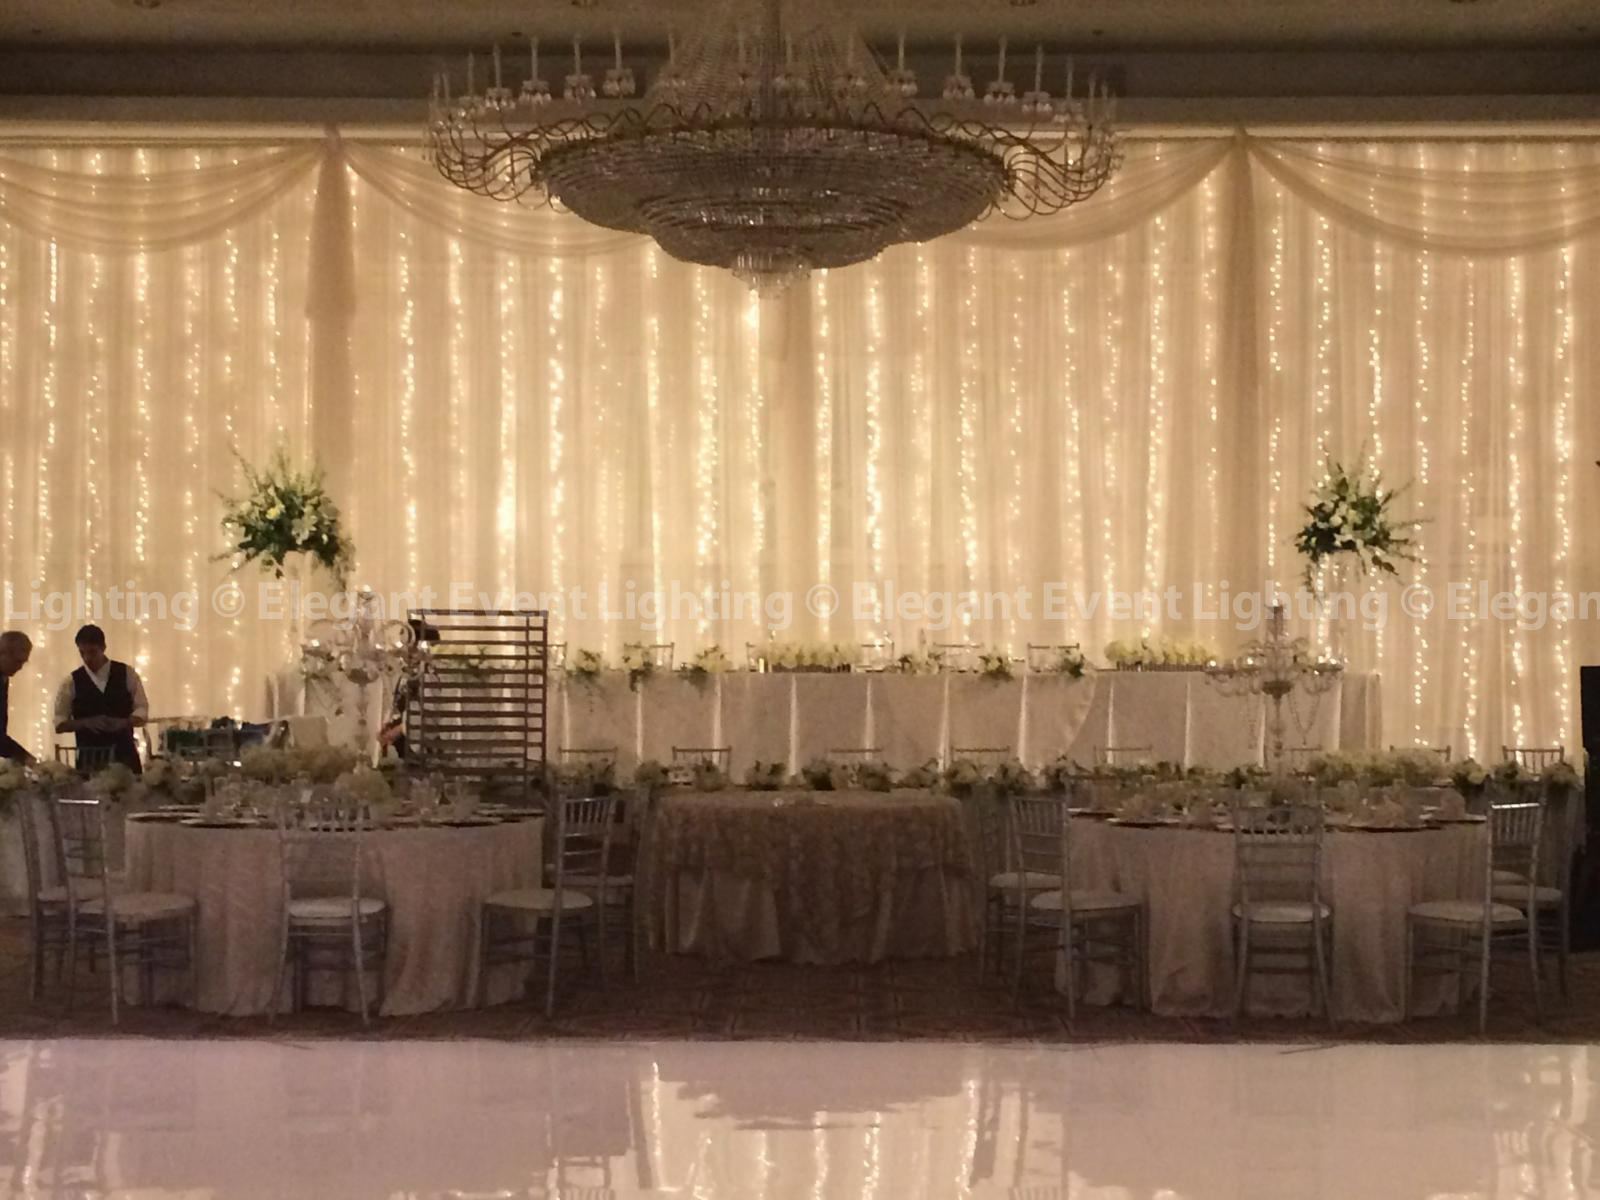 Decorative lights for weddings - Signature Fairy Light Head Table Backdrop Drury Lane